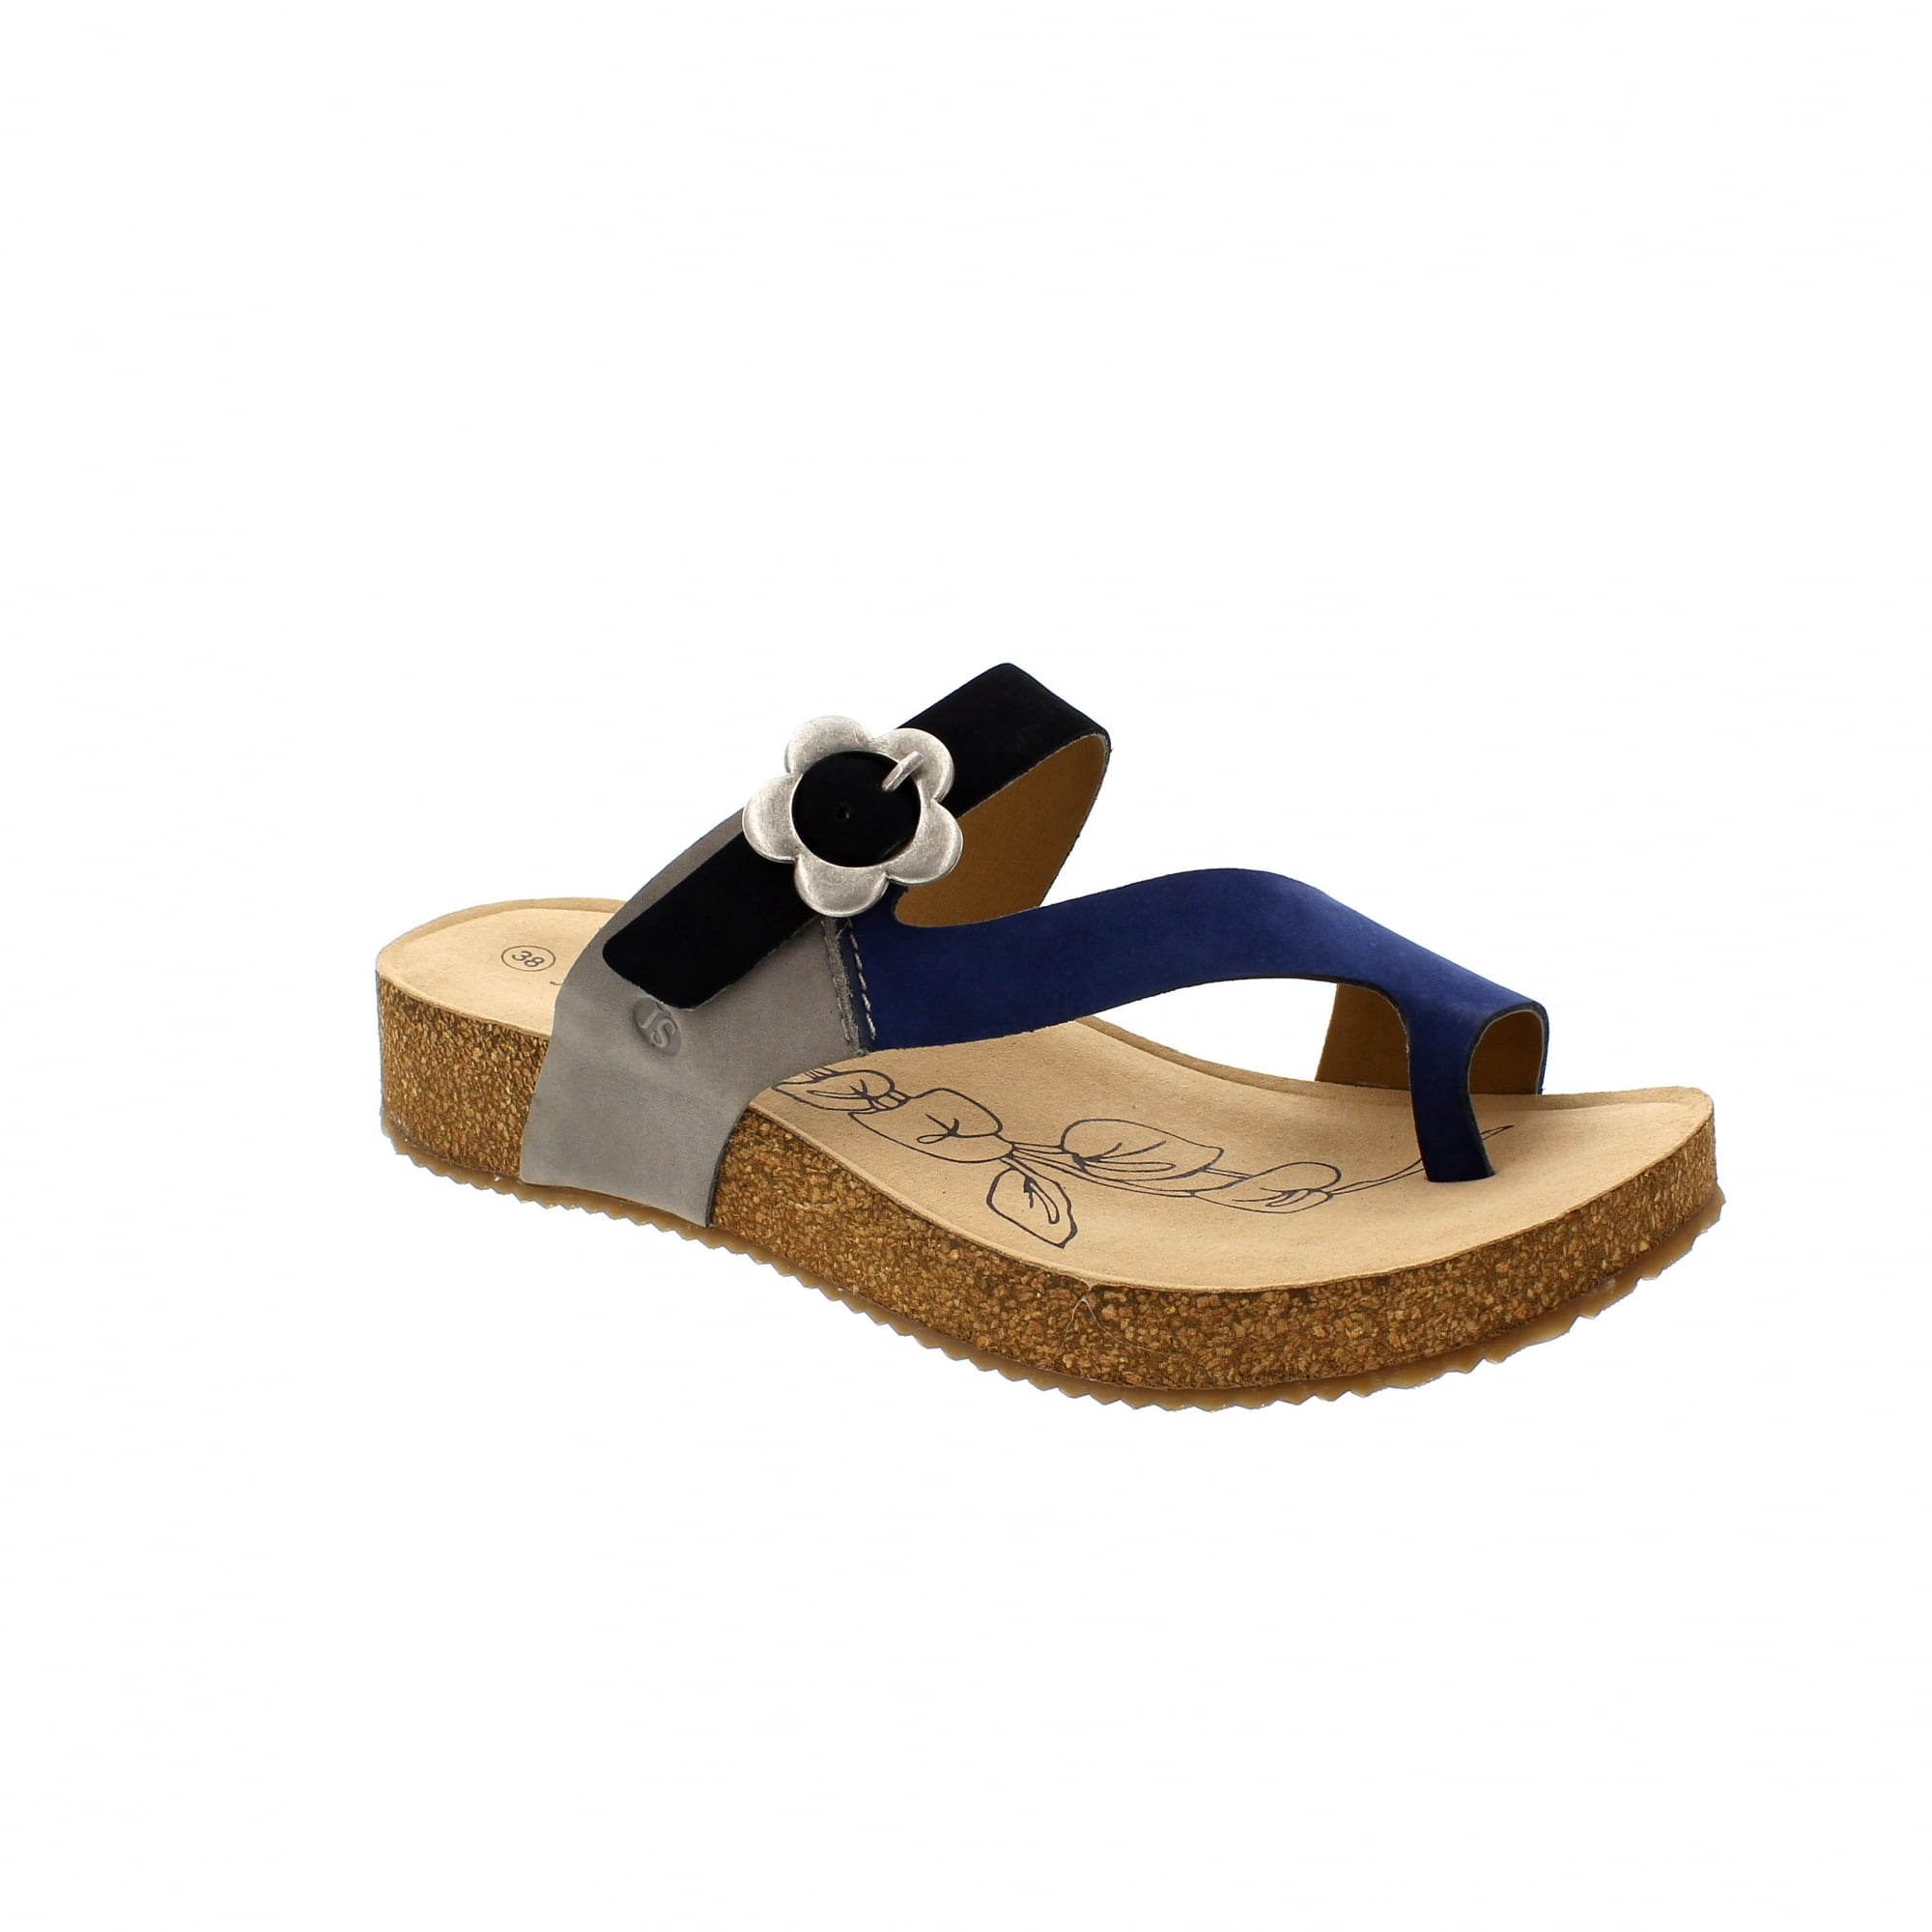 Josef Seibel Tonga 23 78515-724502 Womens Toe Post Sandals b2249c7d3c